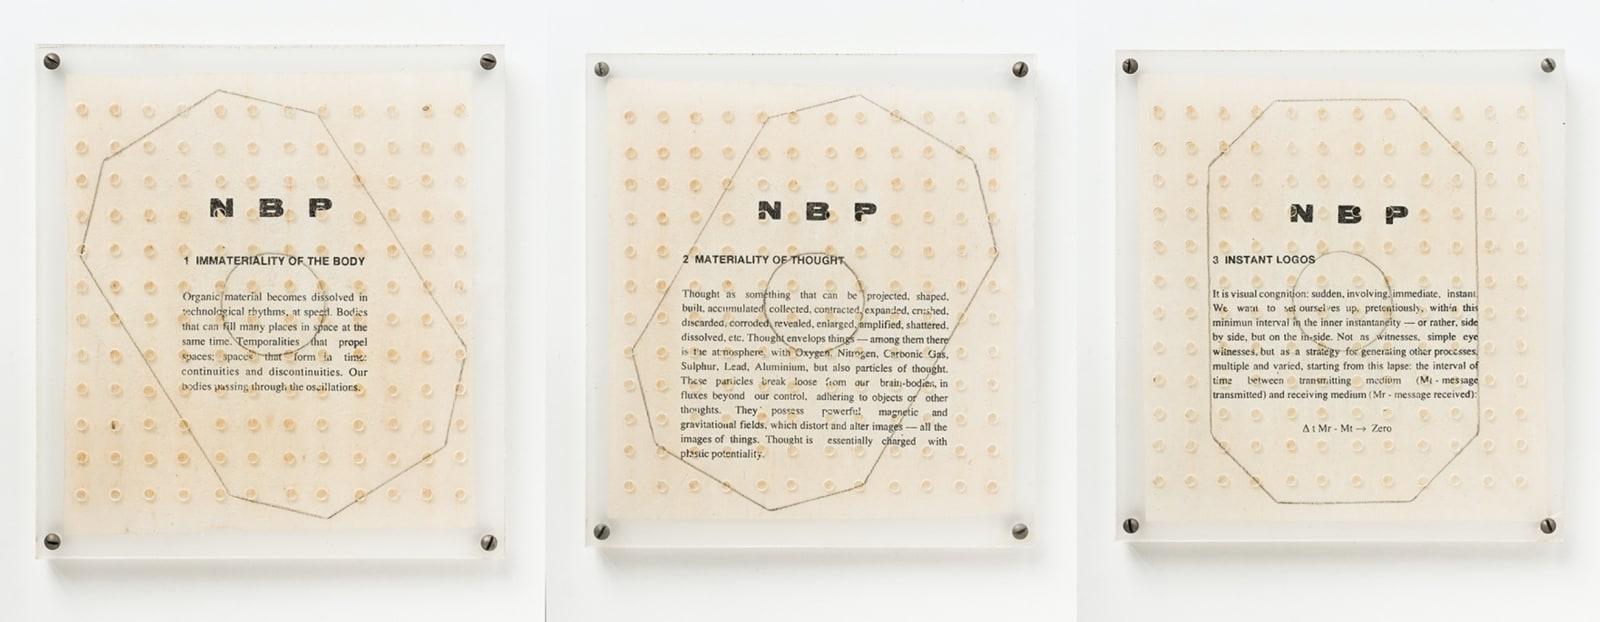 Ricardo Basbaum, NBP - New Bases for Personality, 1991